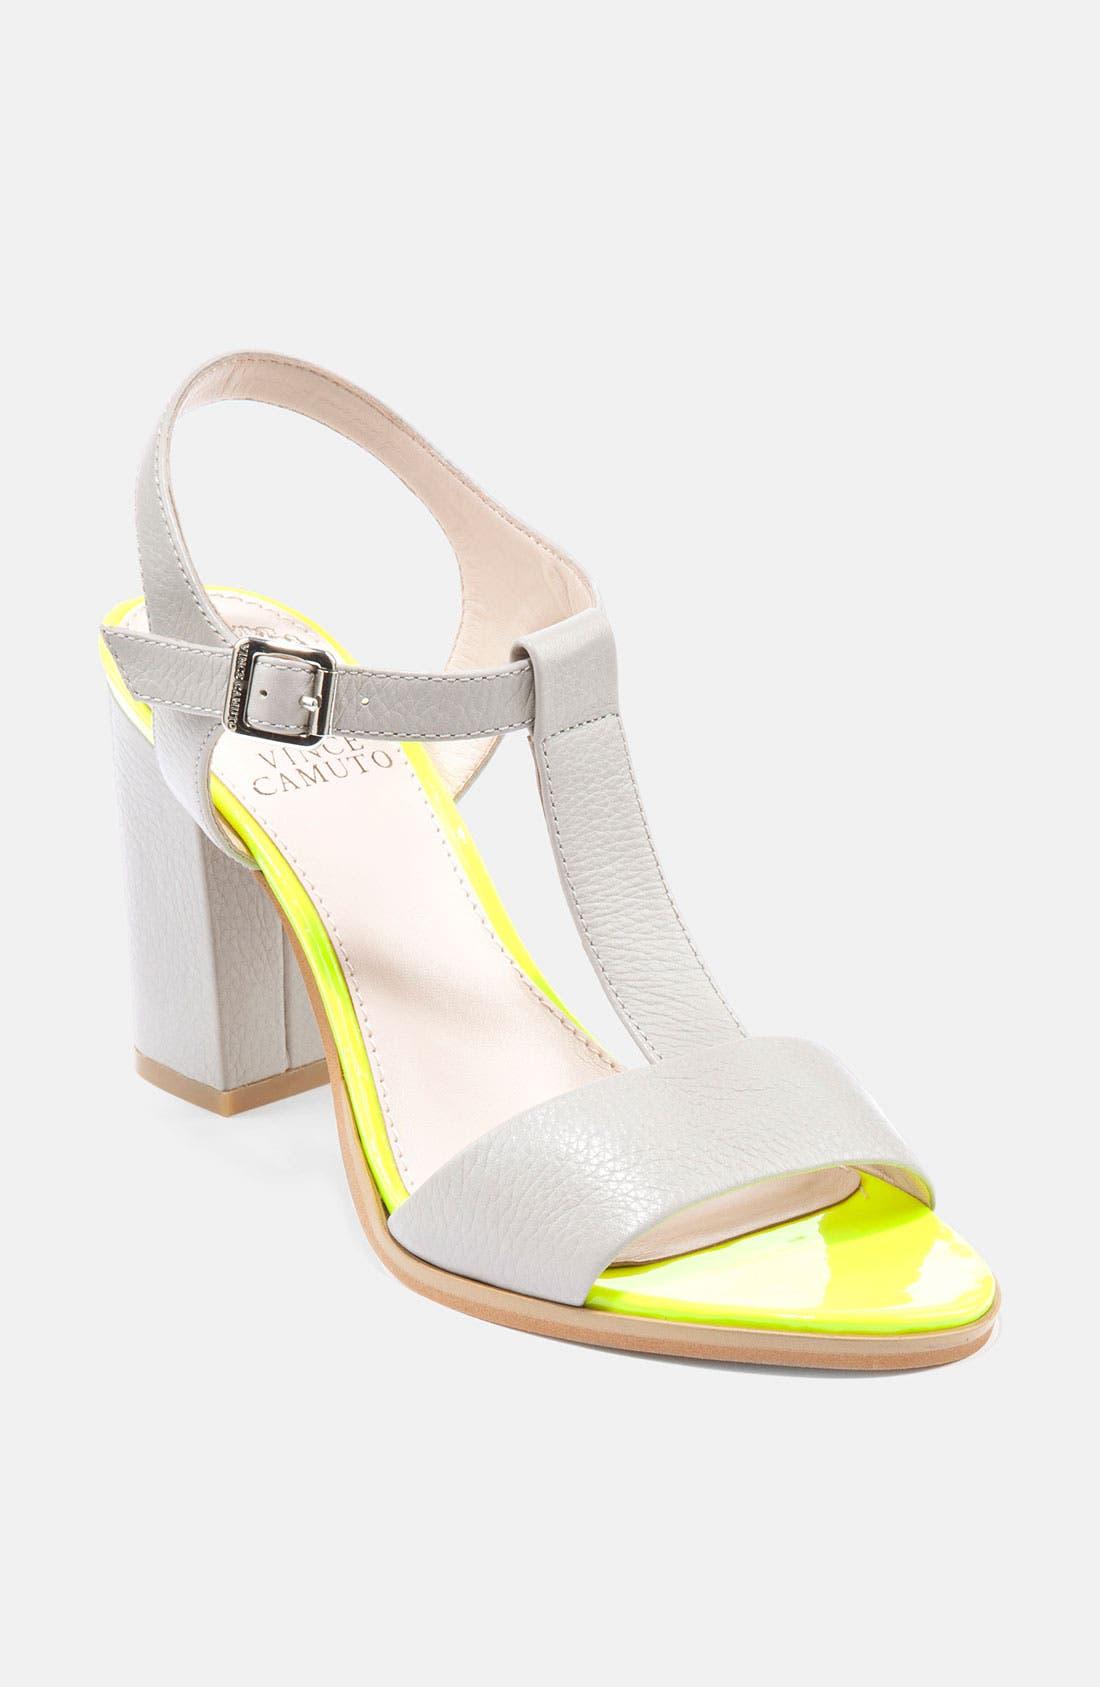 Alternate Image 1 Selected - Vince Camuto 'Novasi' Sandal